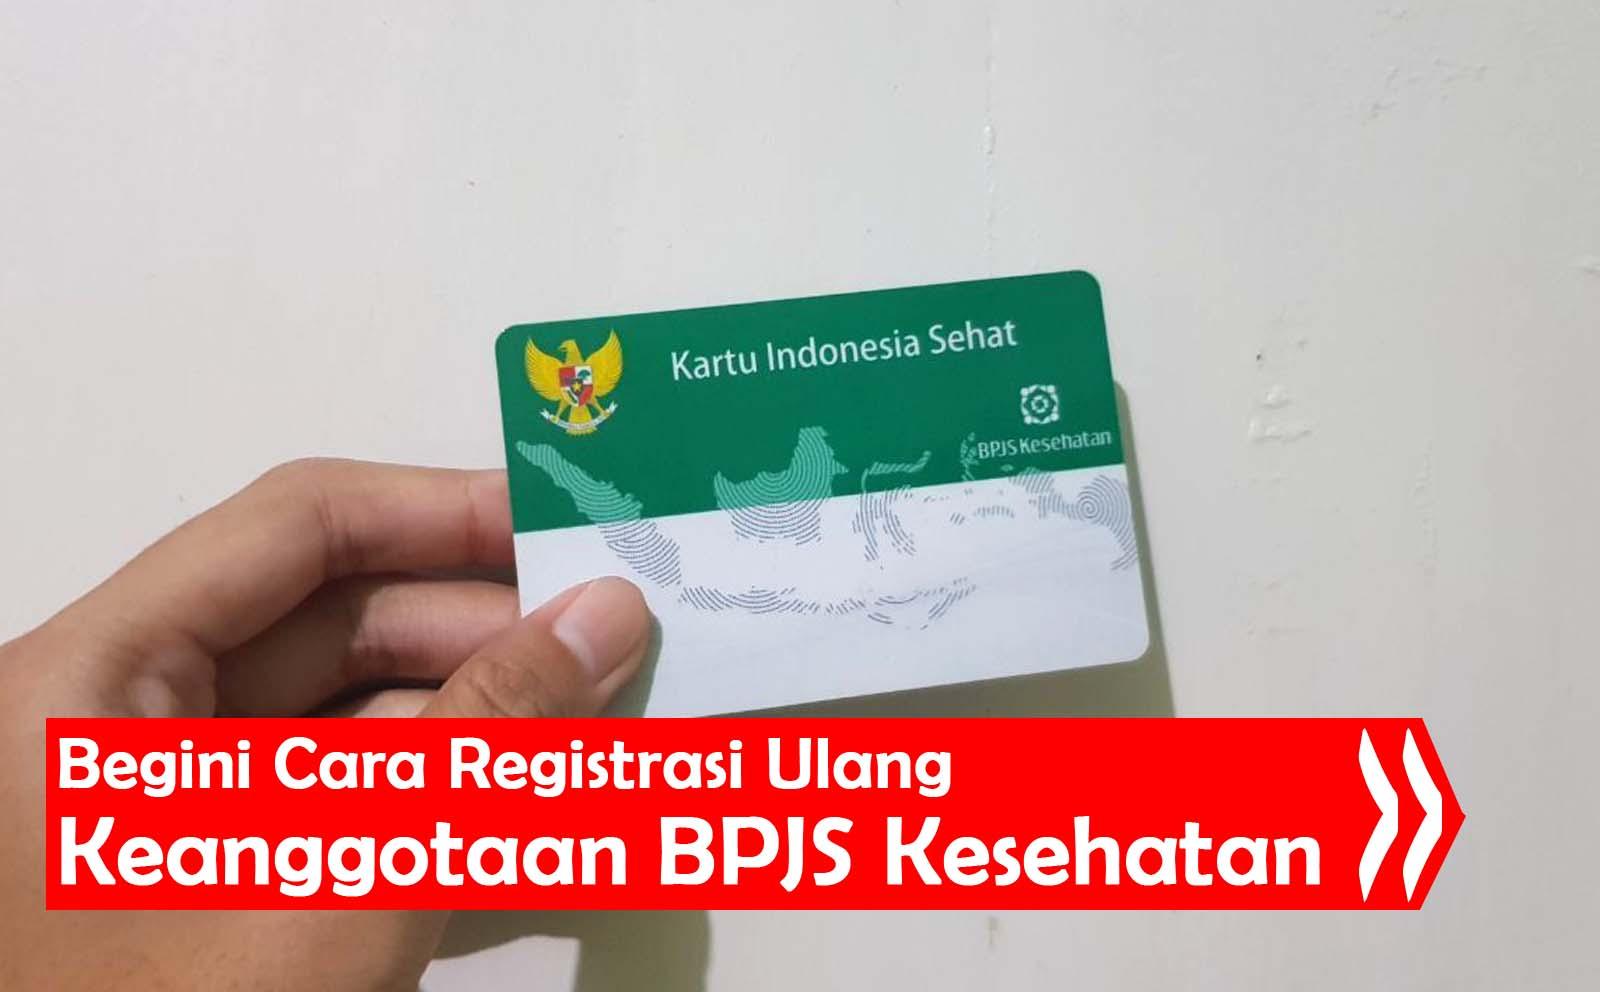 Registrasi BPJS Kesehatan